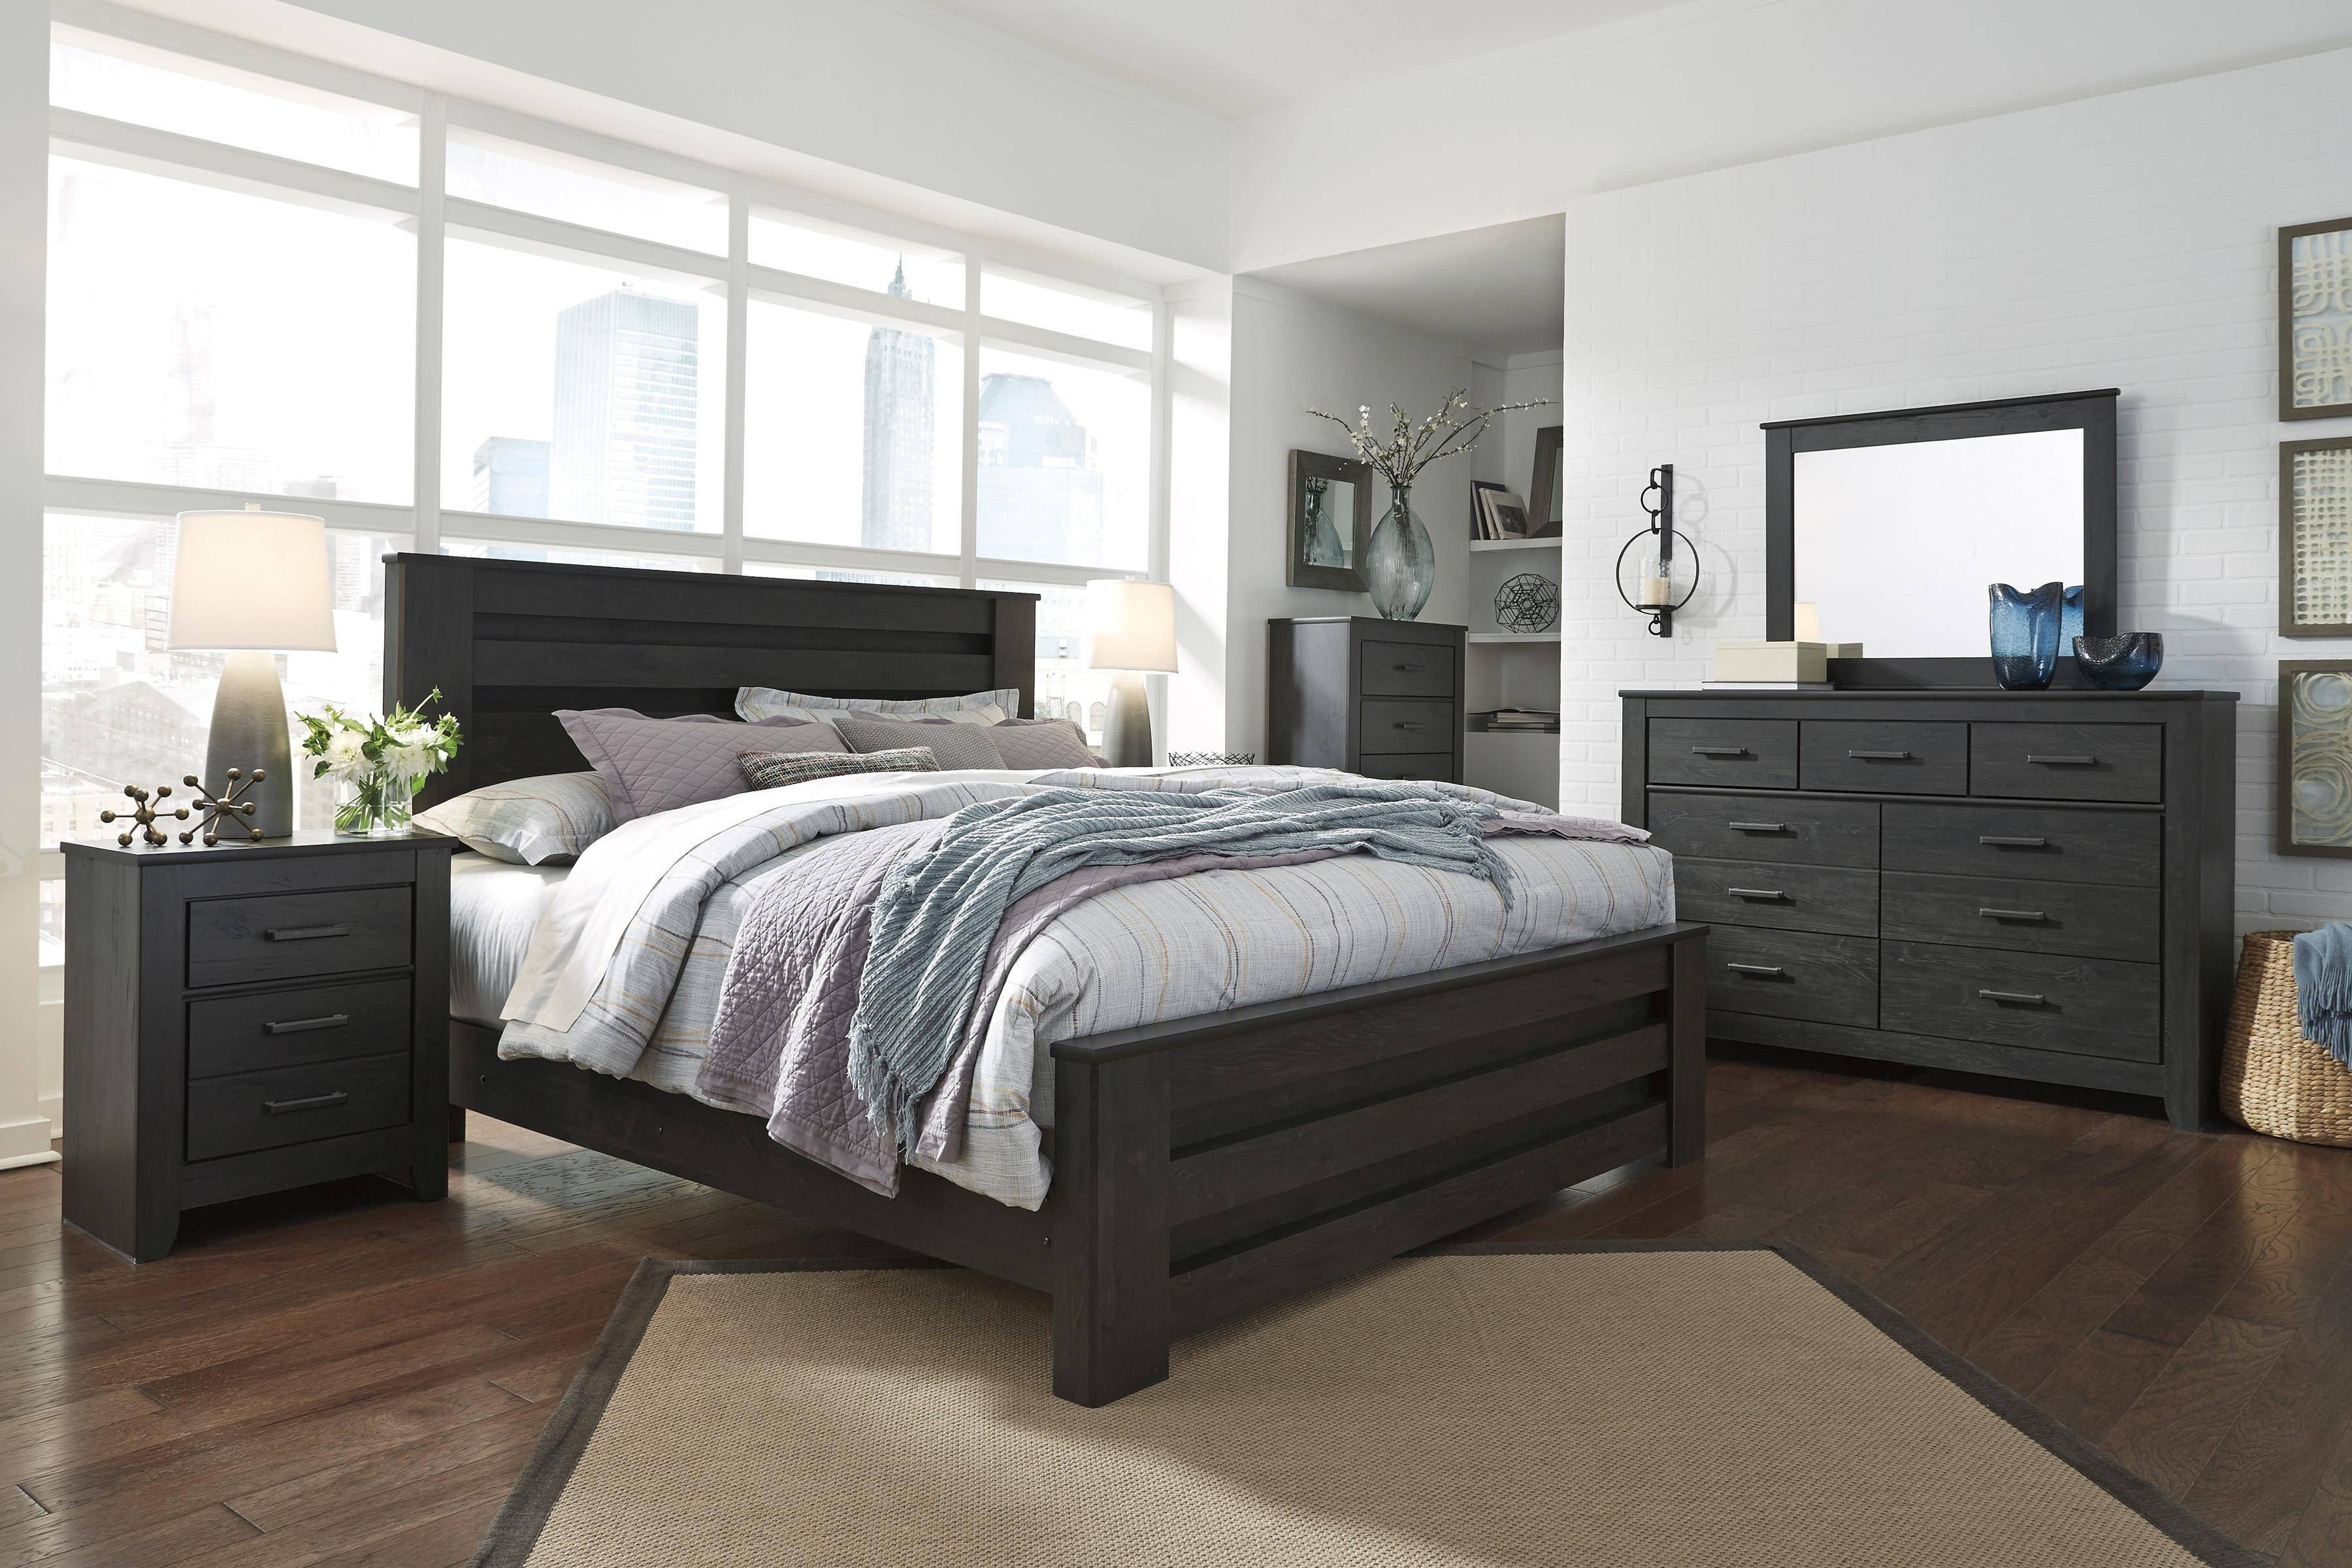 Ashley Furniture Bedroom Set 14 Piece Fresh ashley Brinxton B249 King Size Platform Bedroom Set 6pcs In